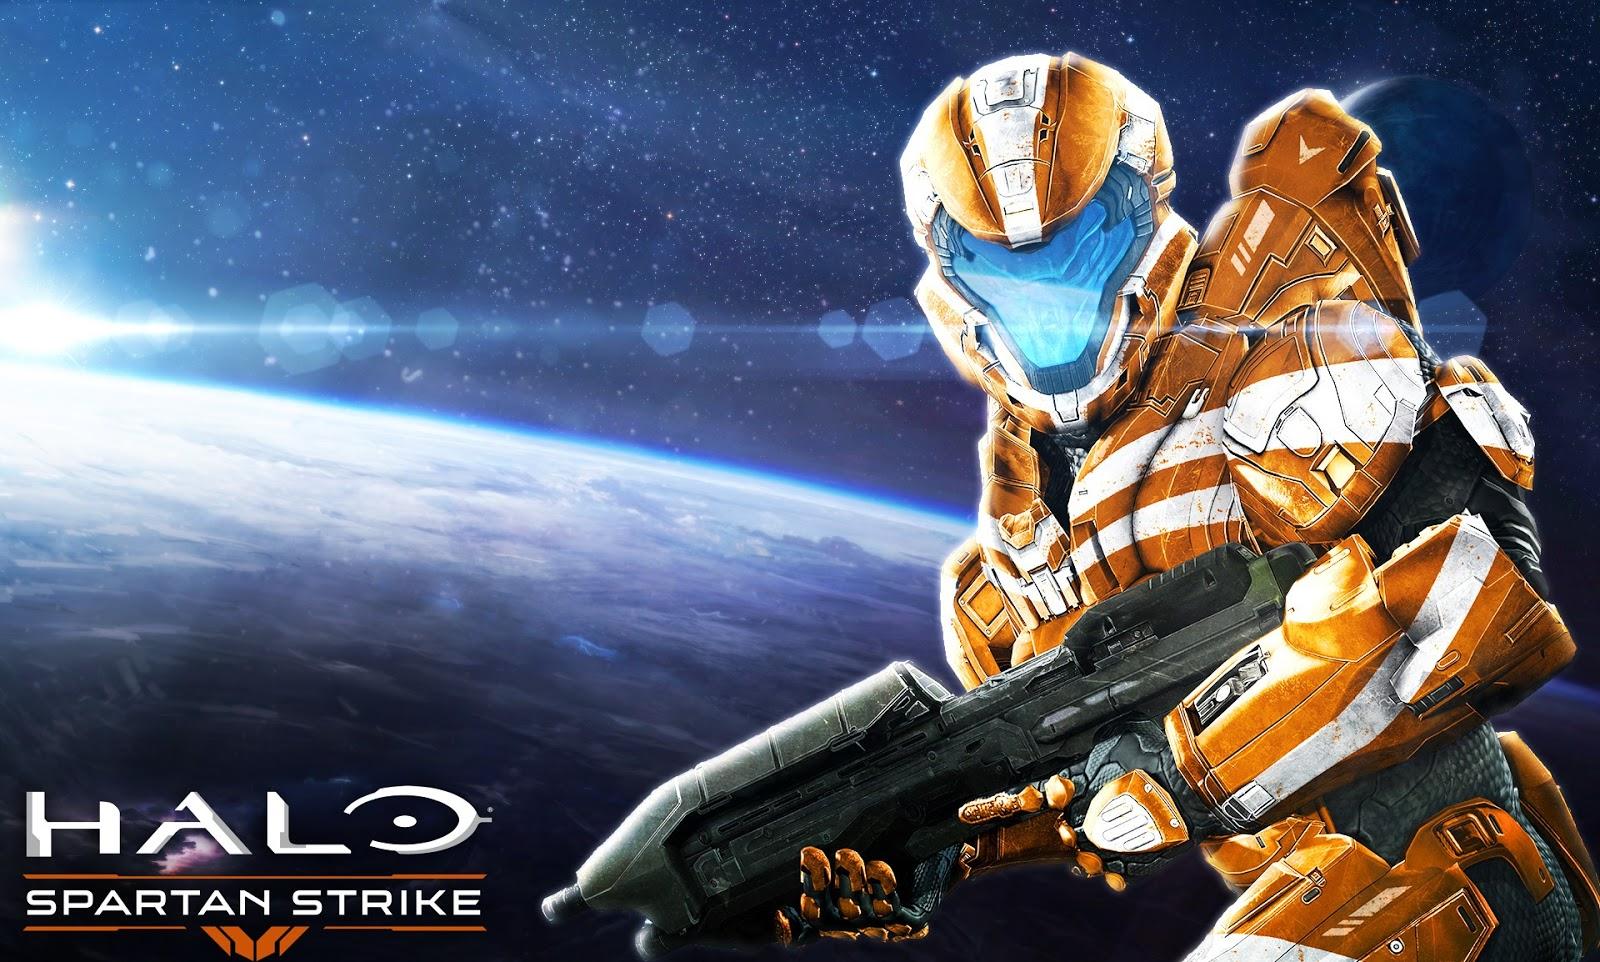 Halo Spartan Strike Pc | GaMingFanZZ